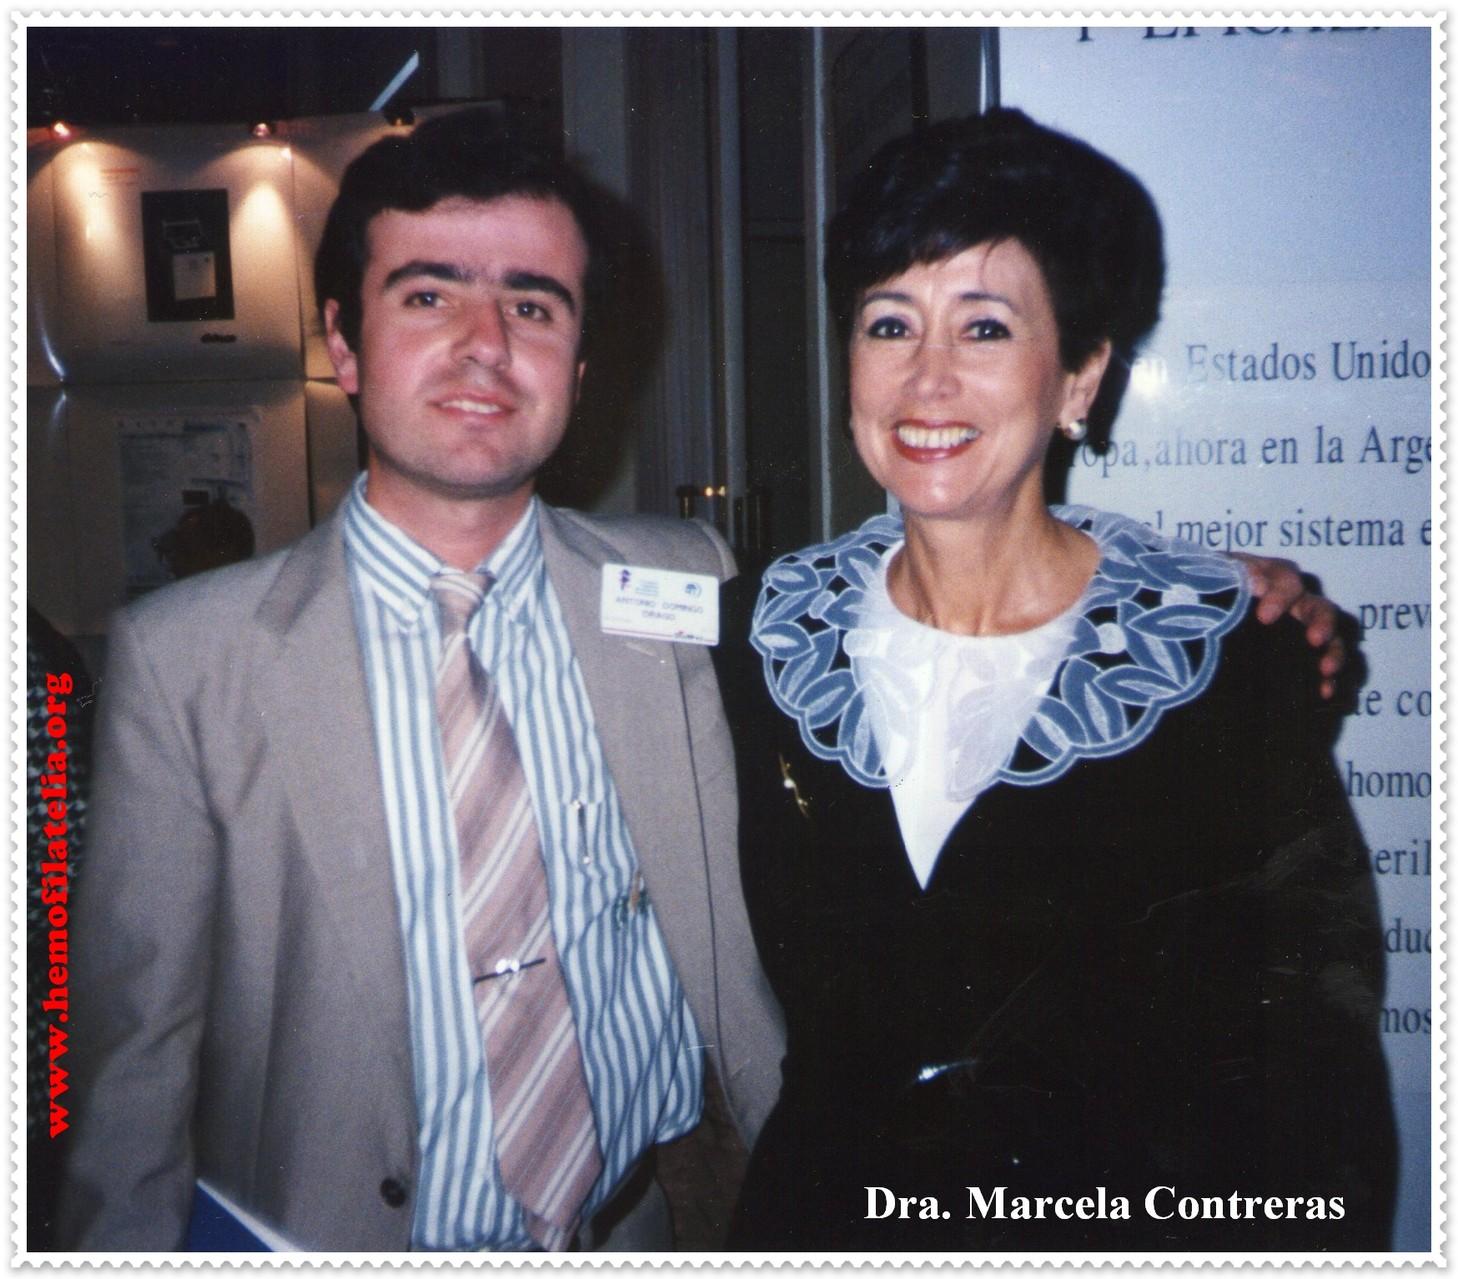 Con la Dra. Marcela Contreras.